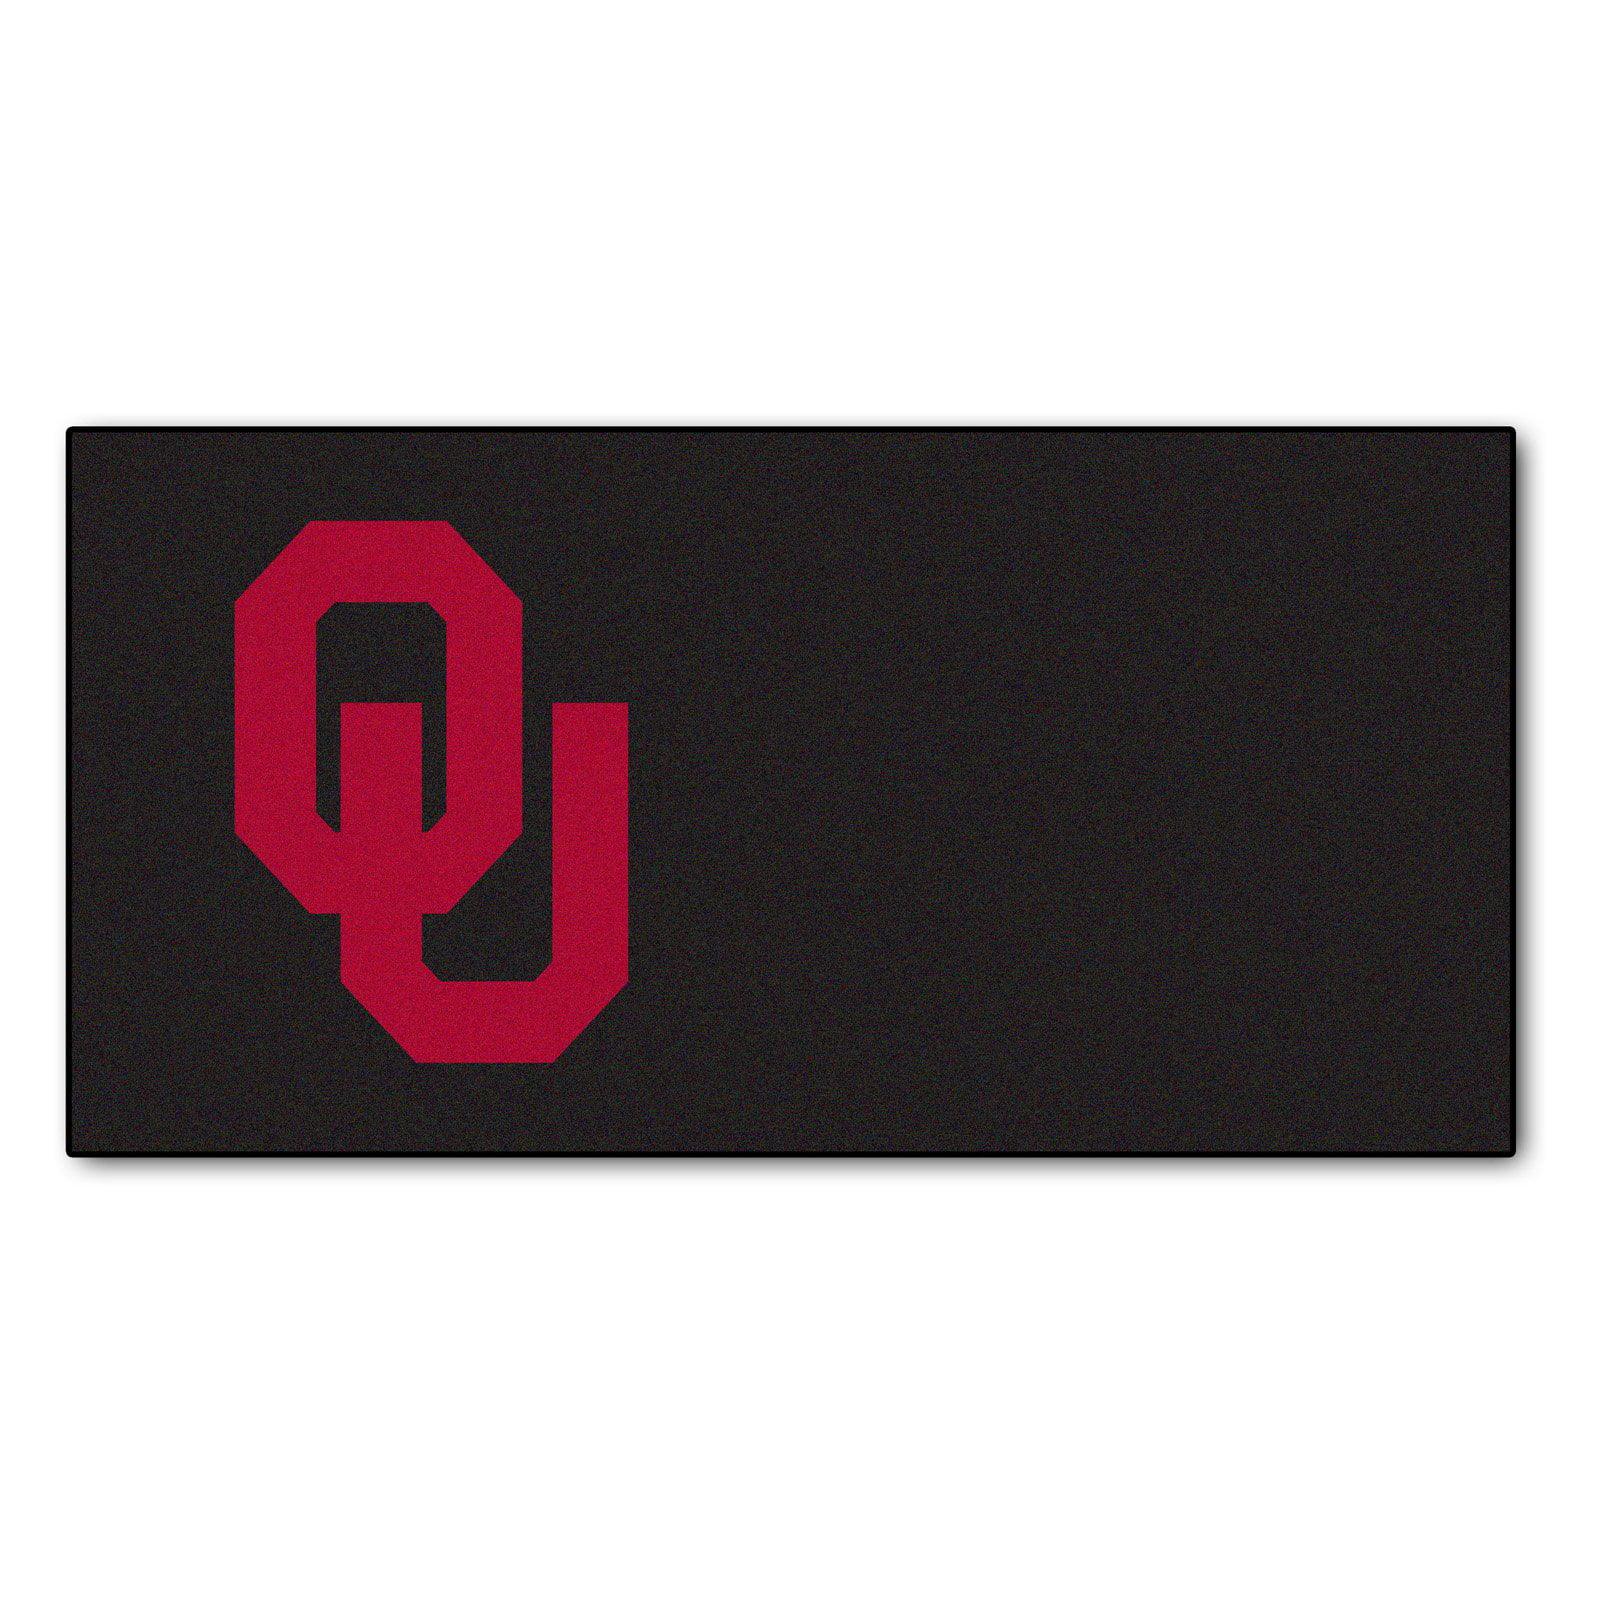 Logo Carpet Tiles - University of Oklahoma